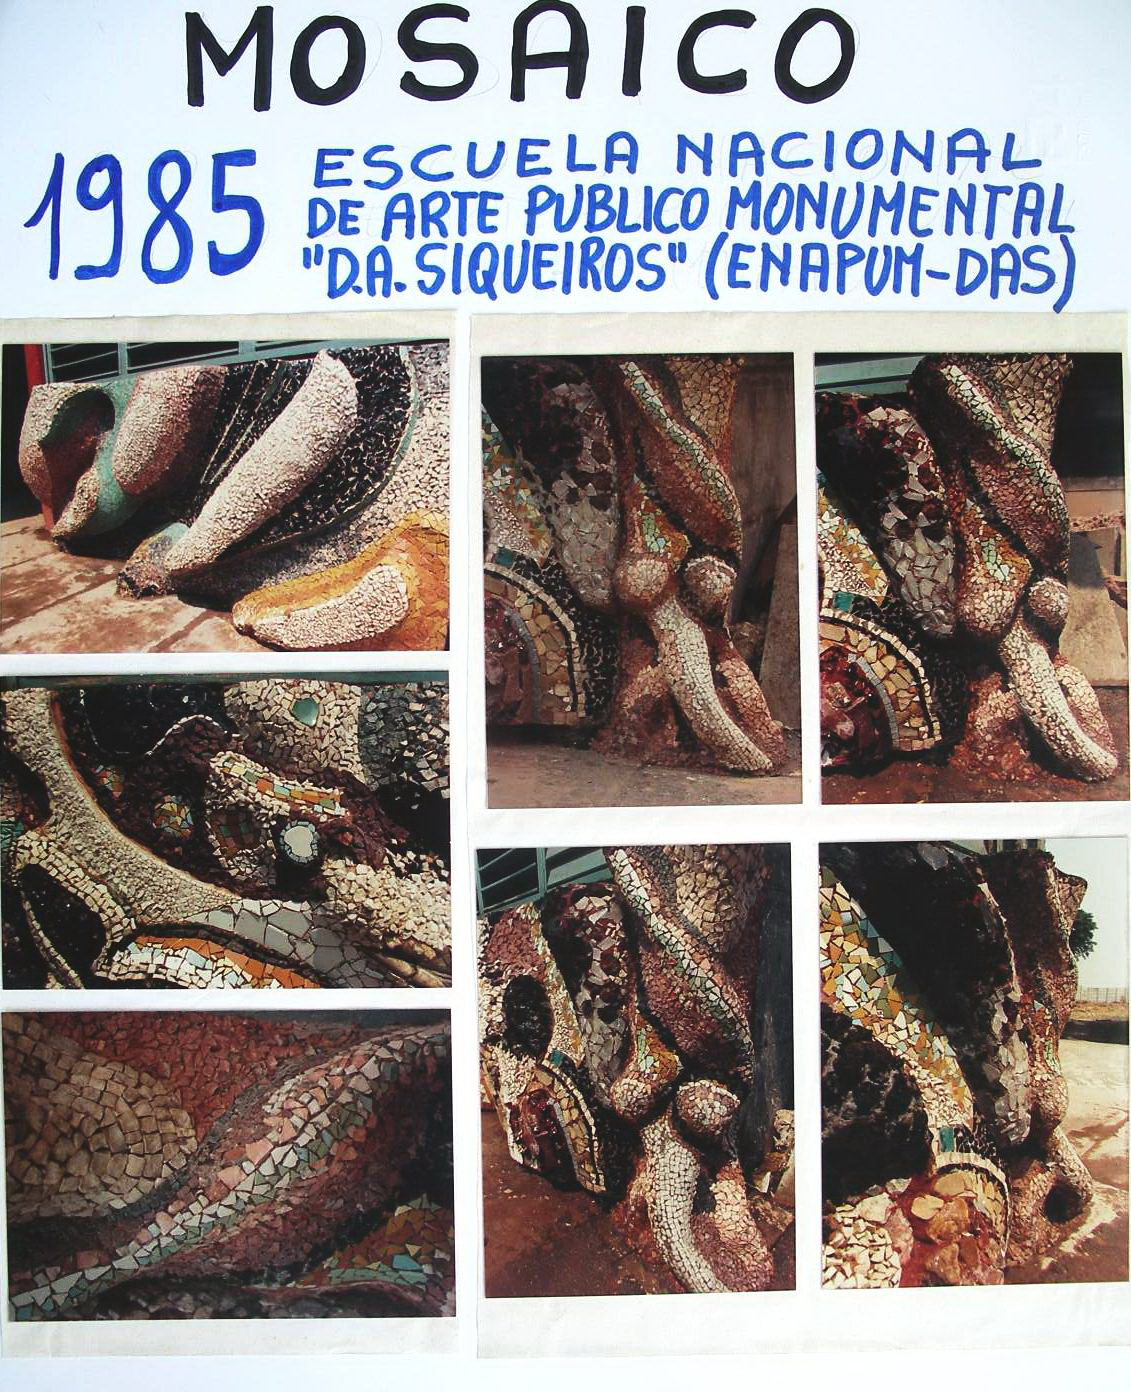 6 - 1985-2 Mosaico nella ENAPUM-DAS